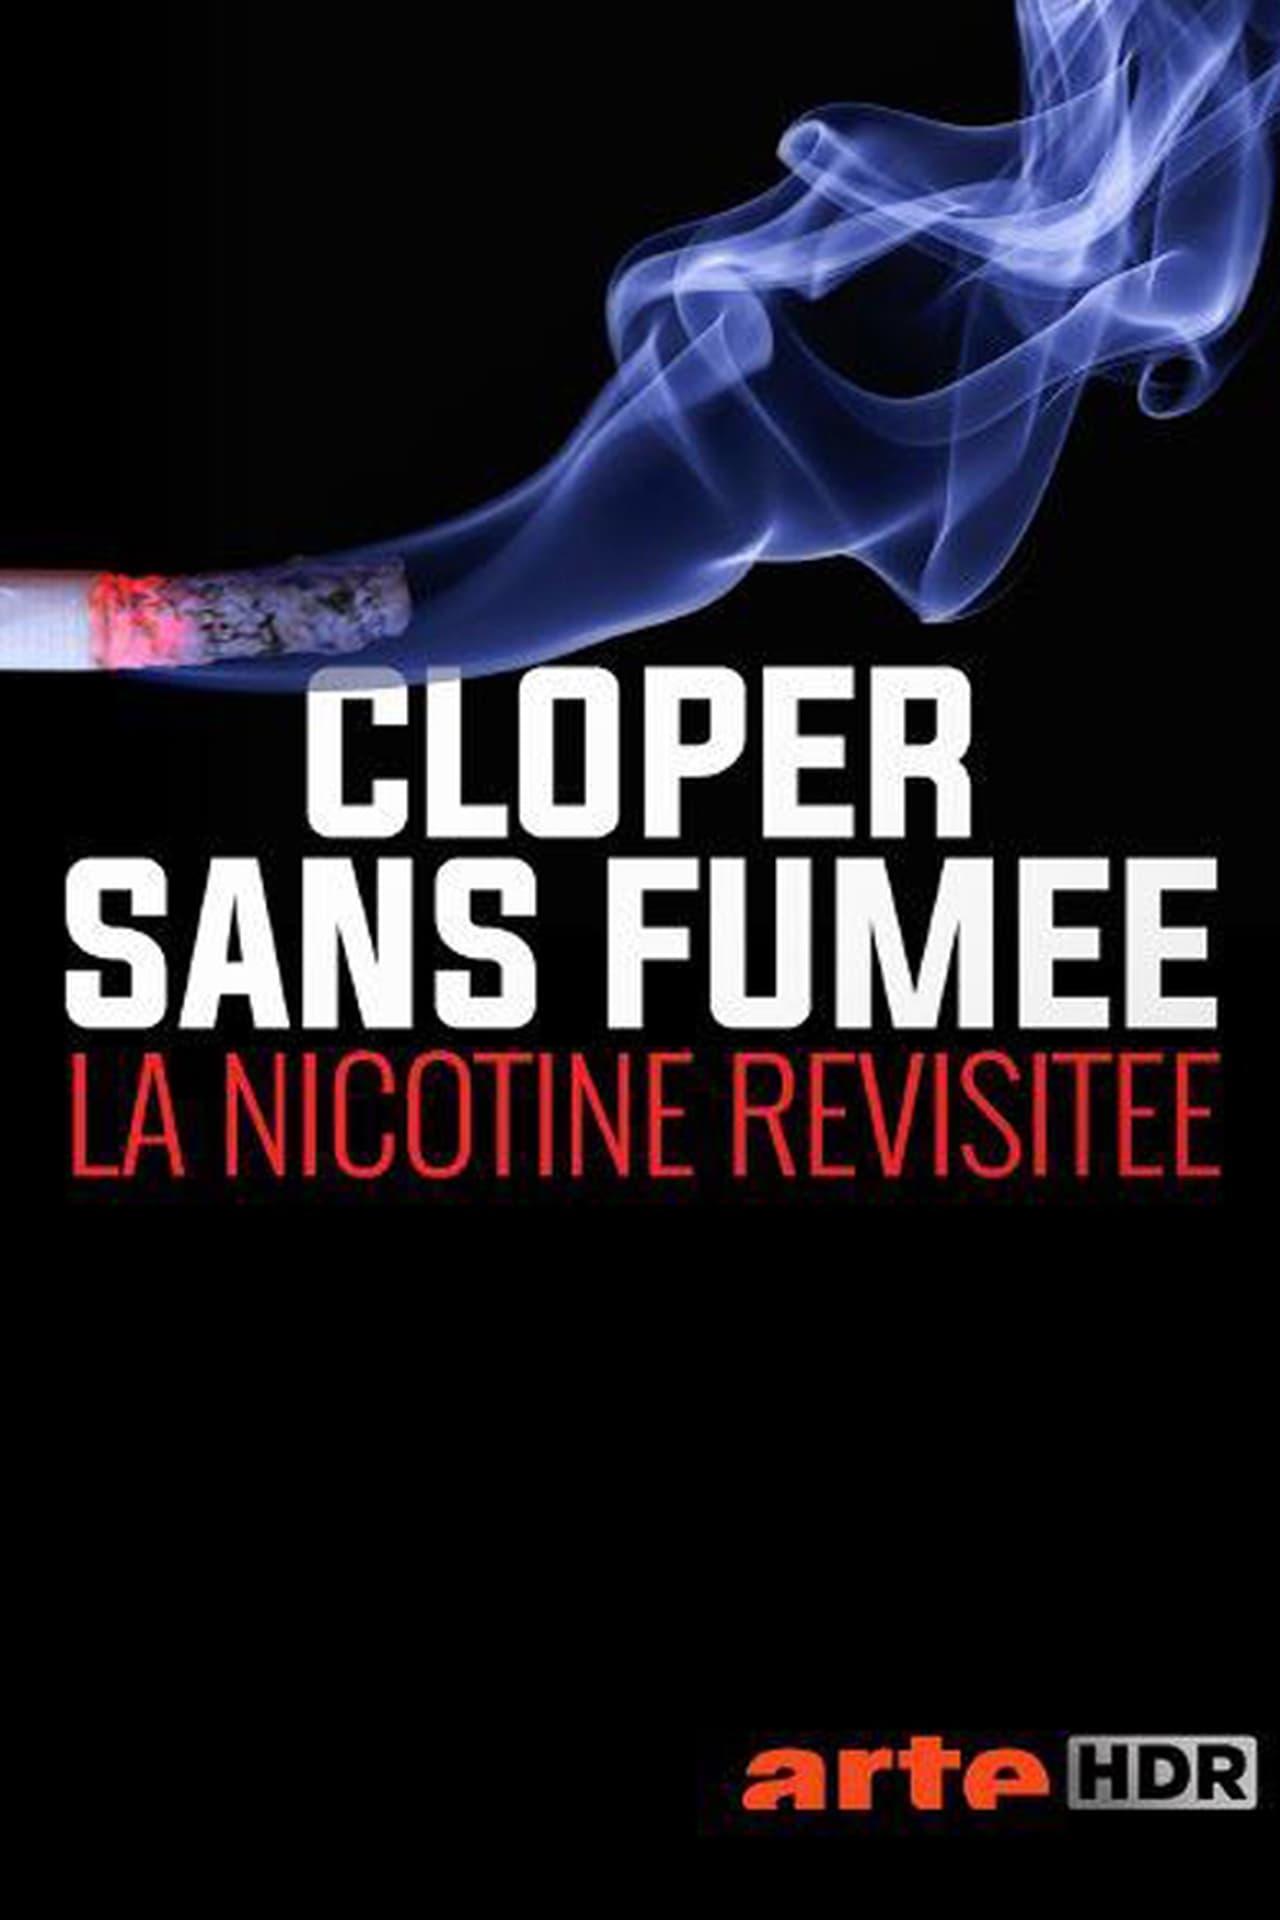 Nikotin - Droge mit Zukunft (2020)